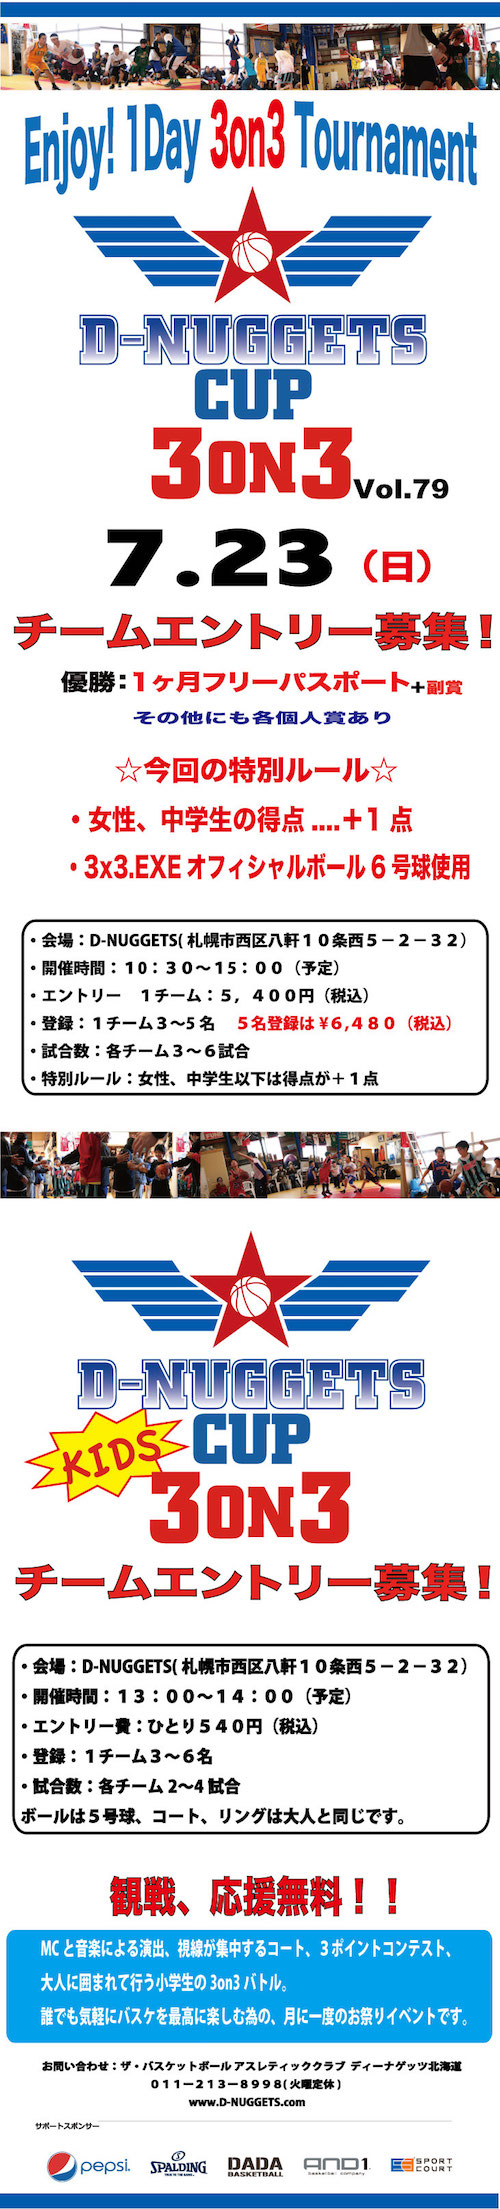 D-NUGGETS-CUP-HOKKAIDO-Vol79.jpg